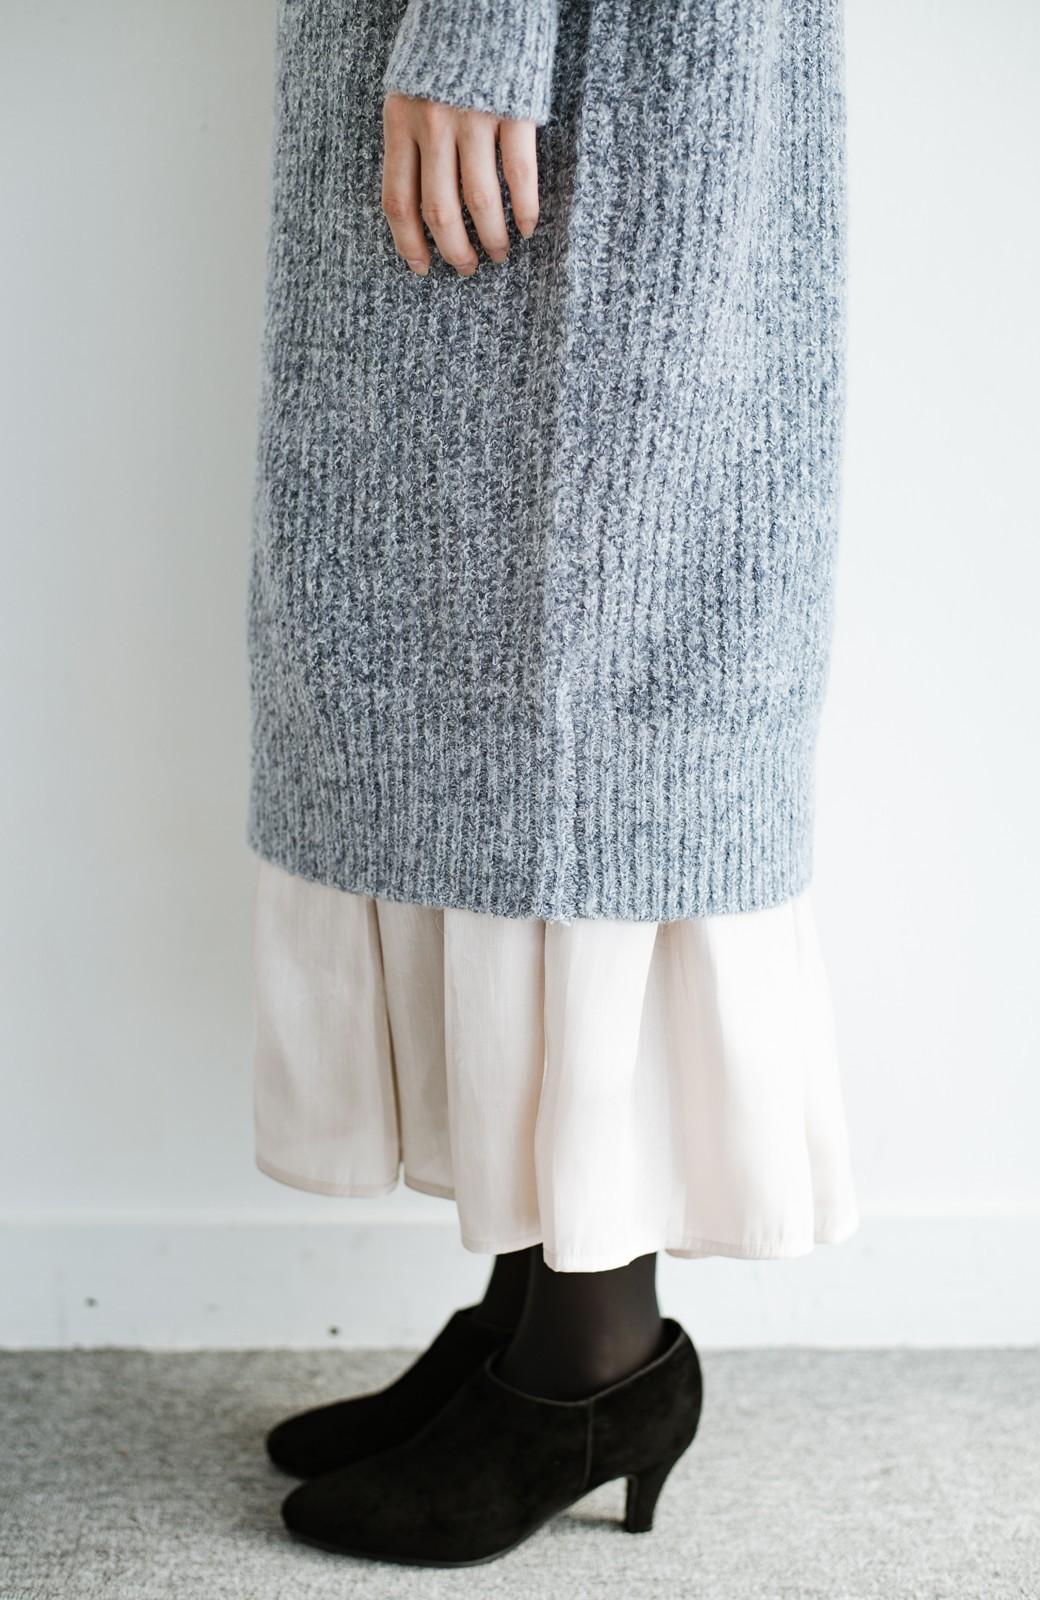 haco! 【人気のため新色追加!】1枚でも重ね着にも便利なキラキラ素材がかわいいロングスカート by laulea <アイボリー>の商品写真11